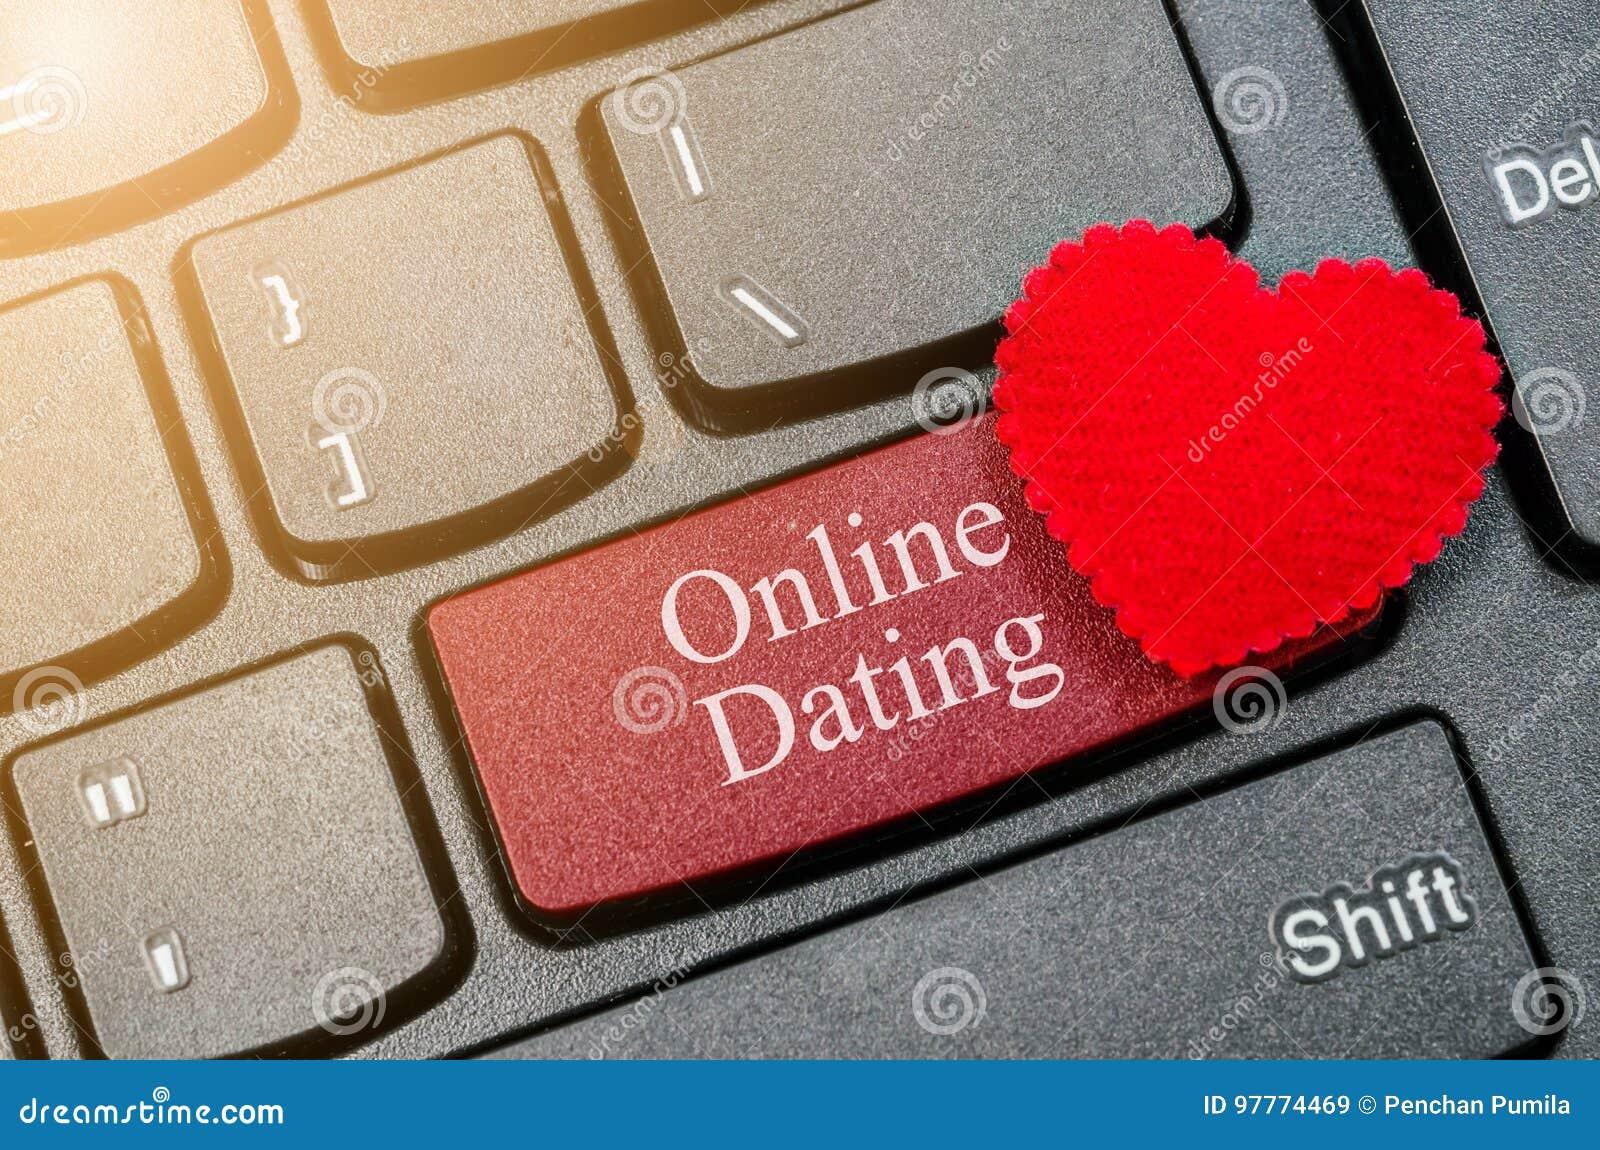 Cyber dating